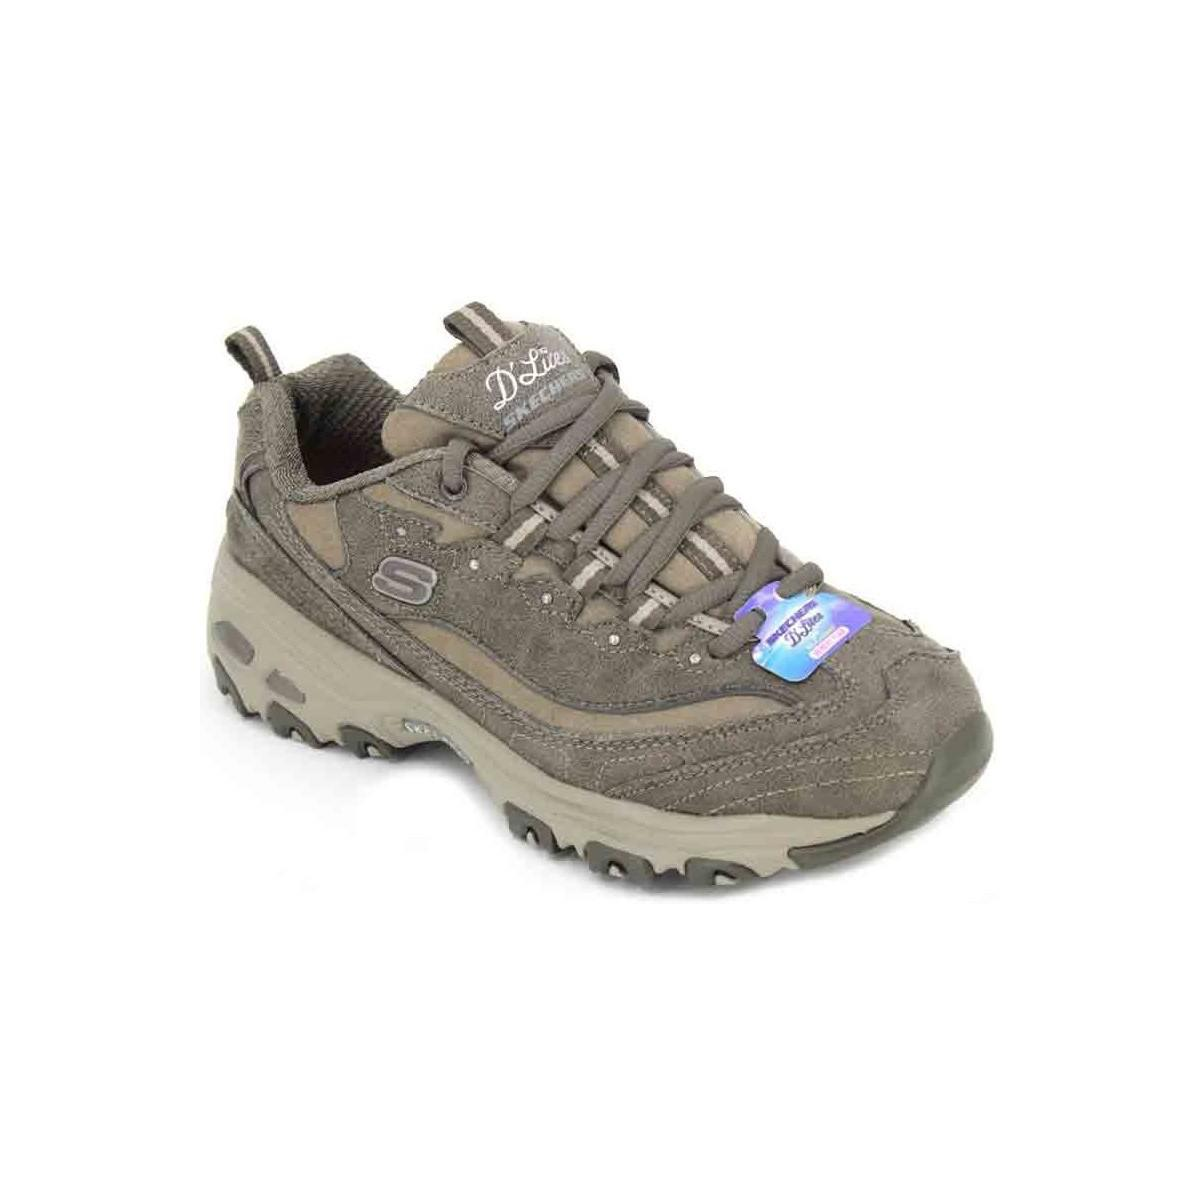 dceddafecf8f Skechers. Natural D lites New School 13085 Women s Trainers Women s Shoes  (trainers) In Beige